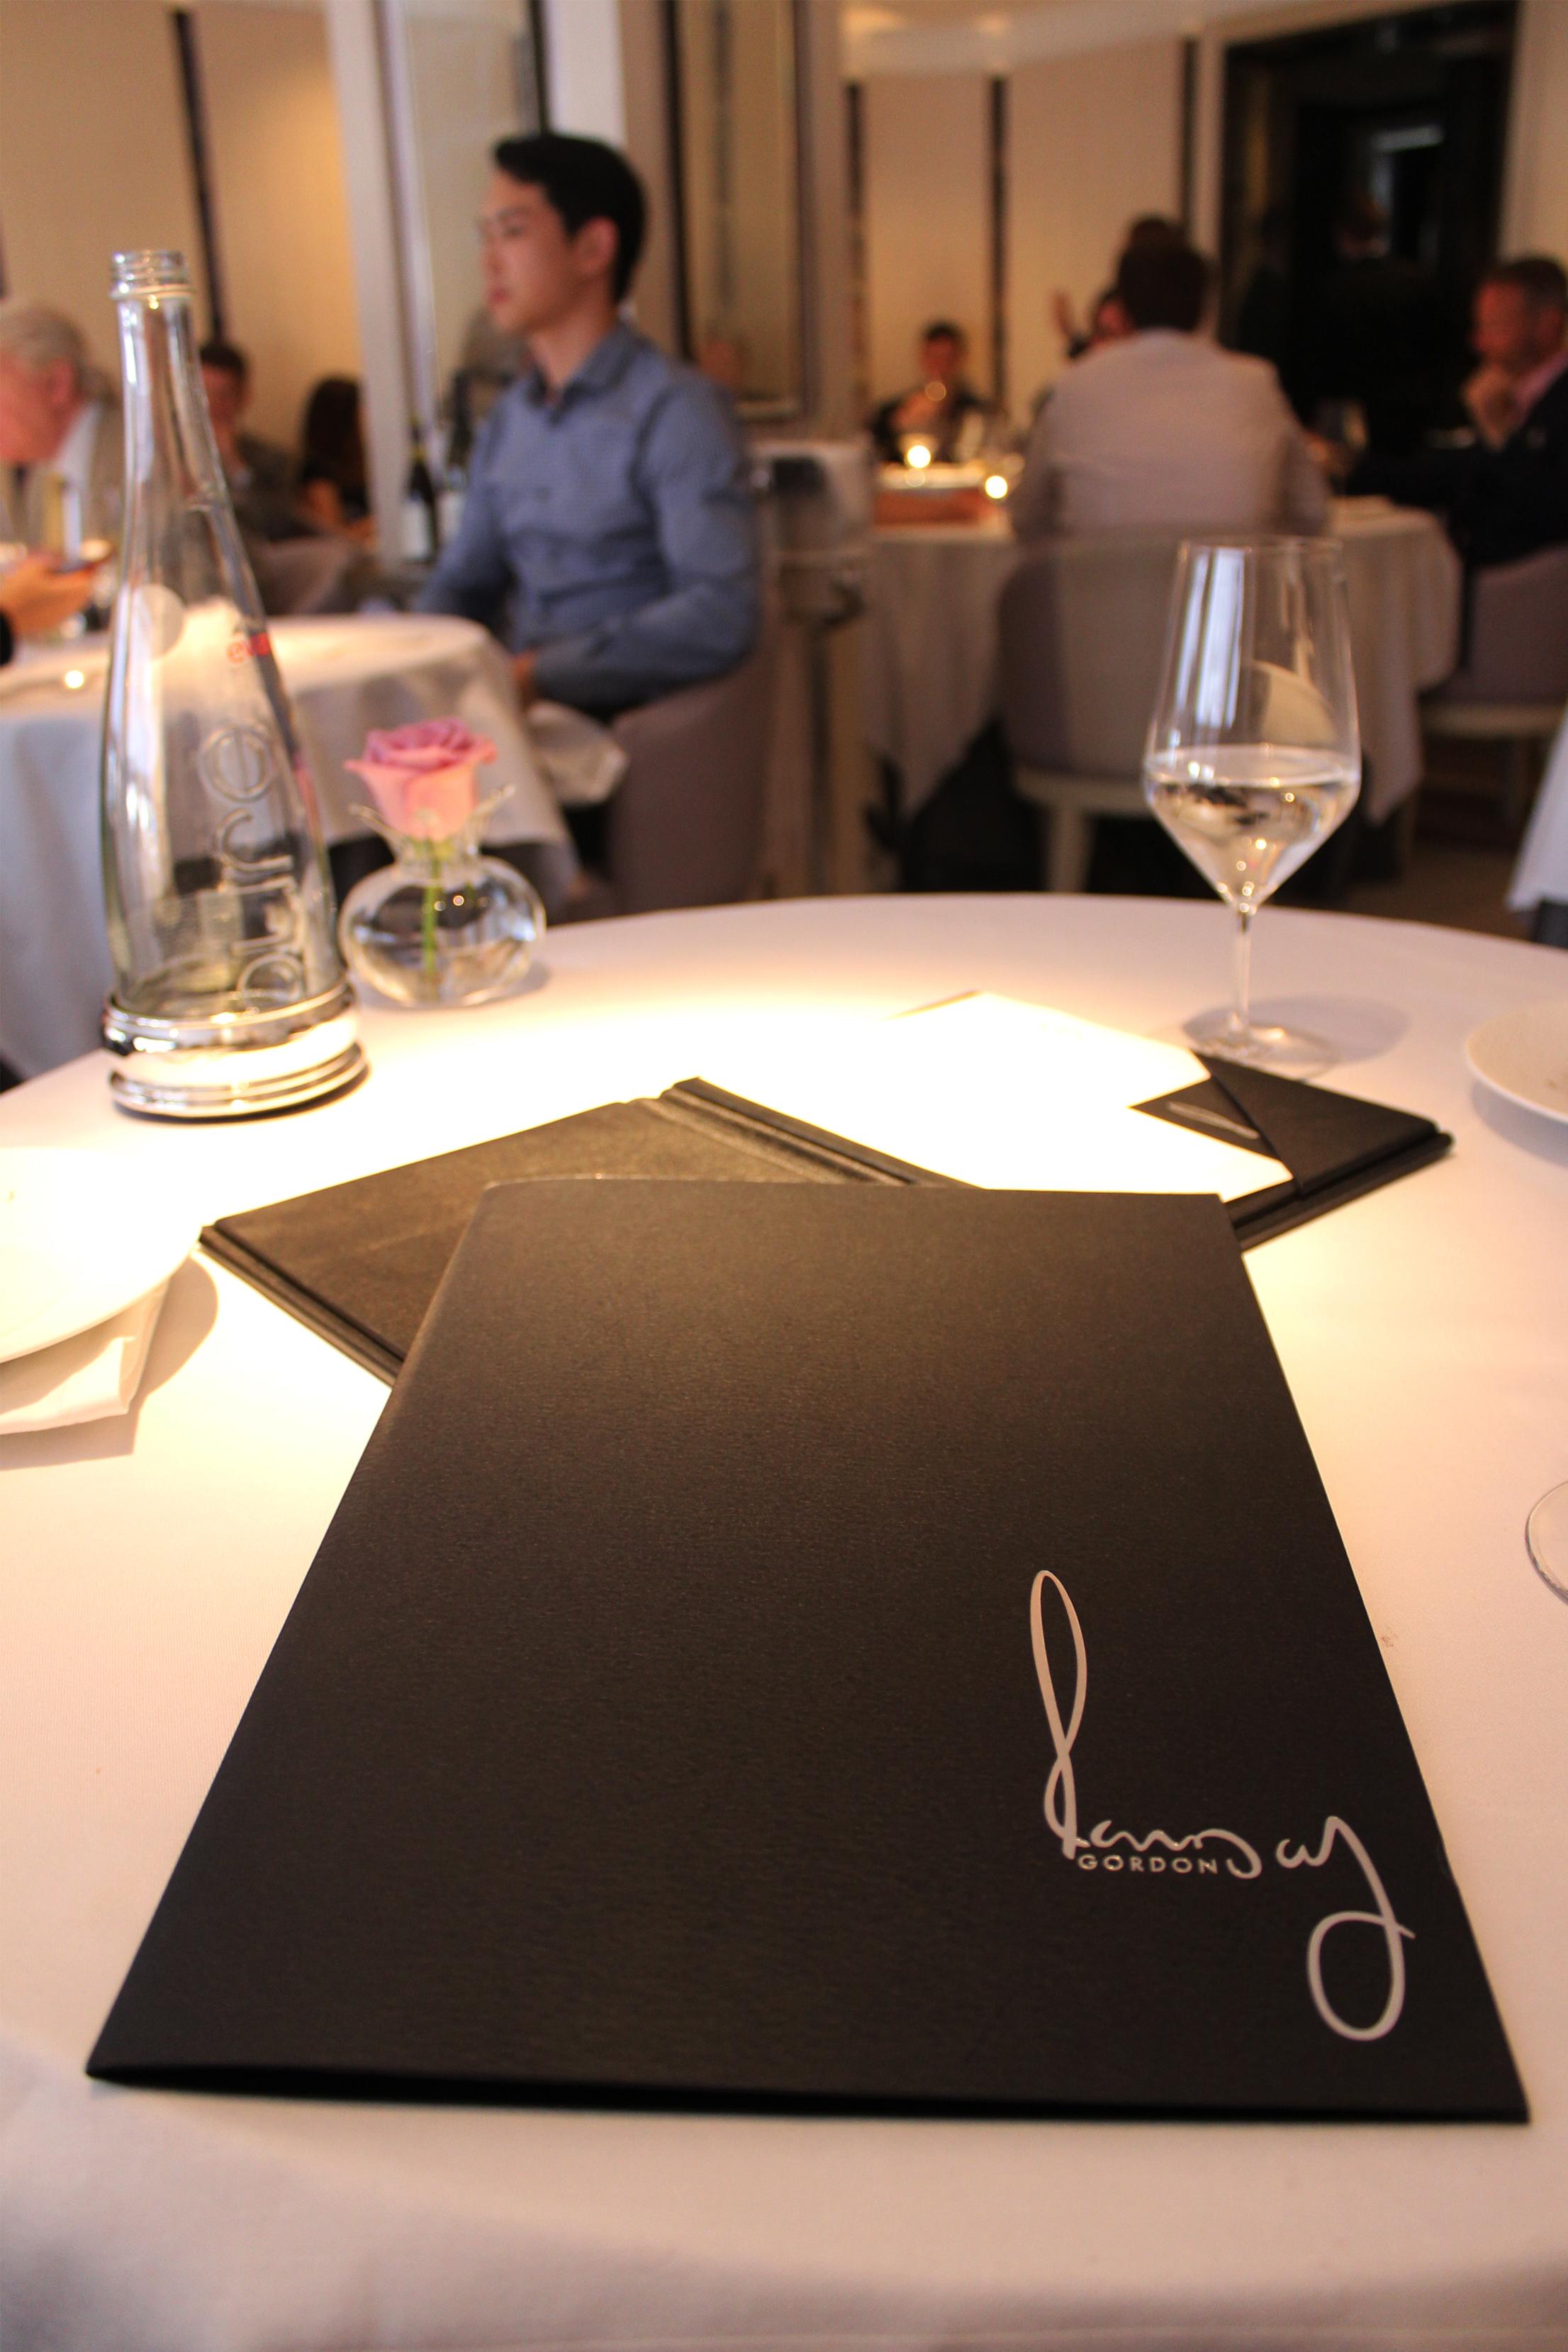 Gordon Ramsay 3 A Gorgeous Lunch At Restaurant Gordon Ramsay In Chelsea  Selene + How To